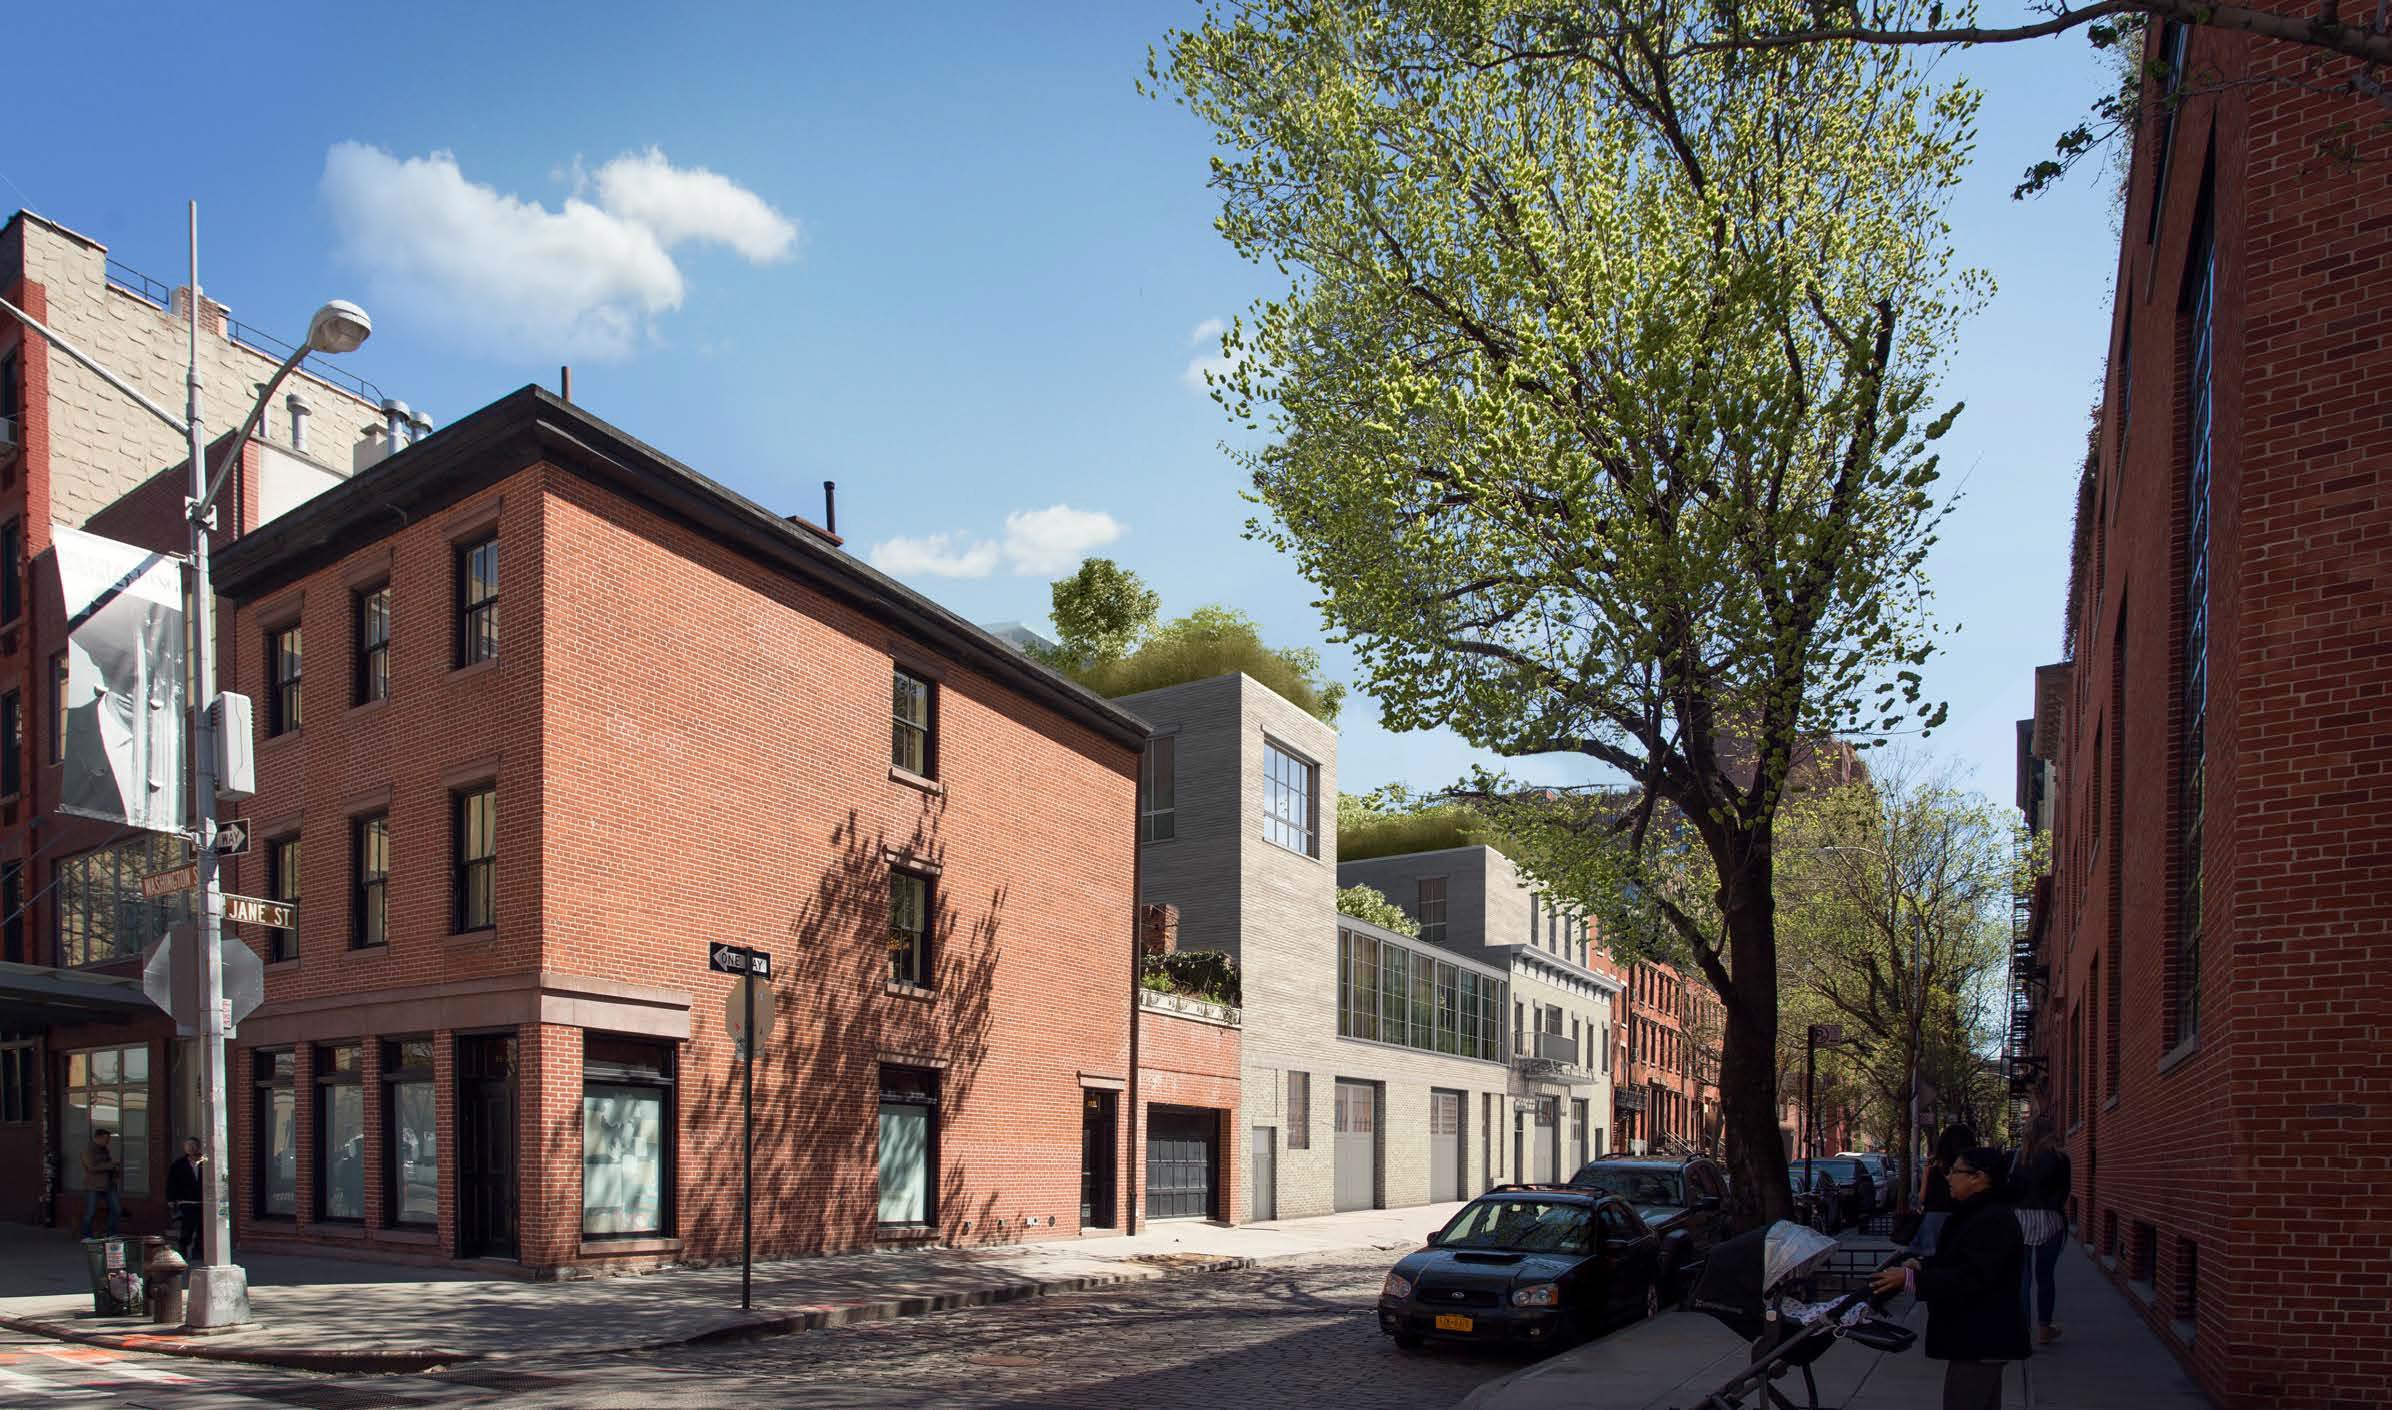 Revised proposal for 85-89 Jane Street